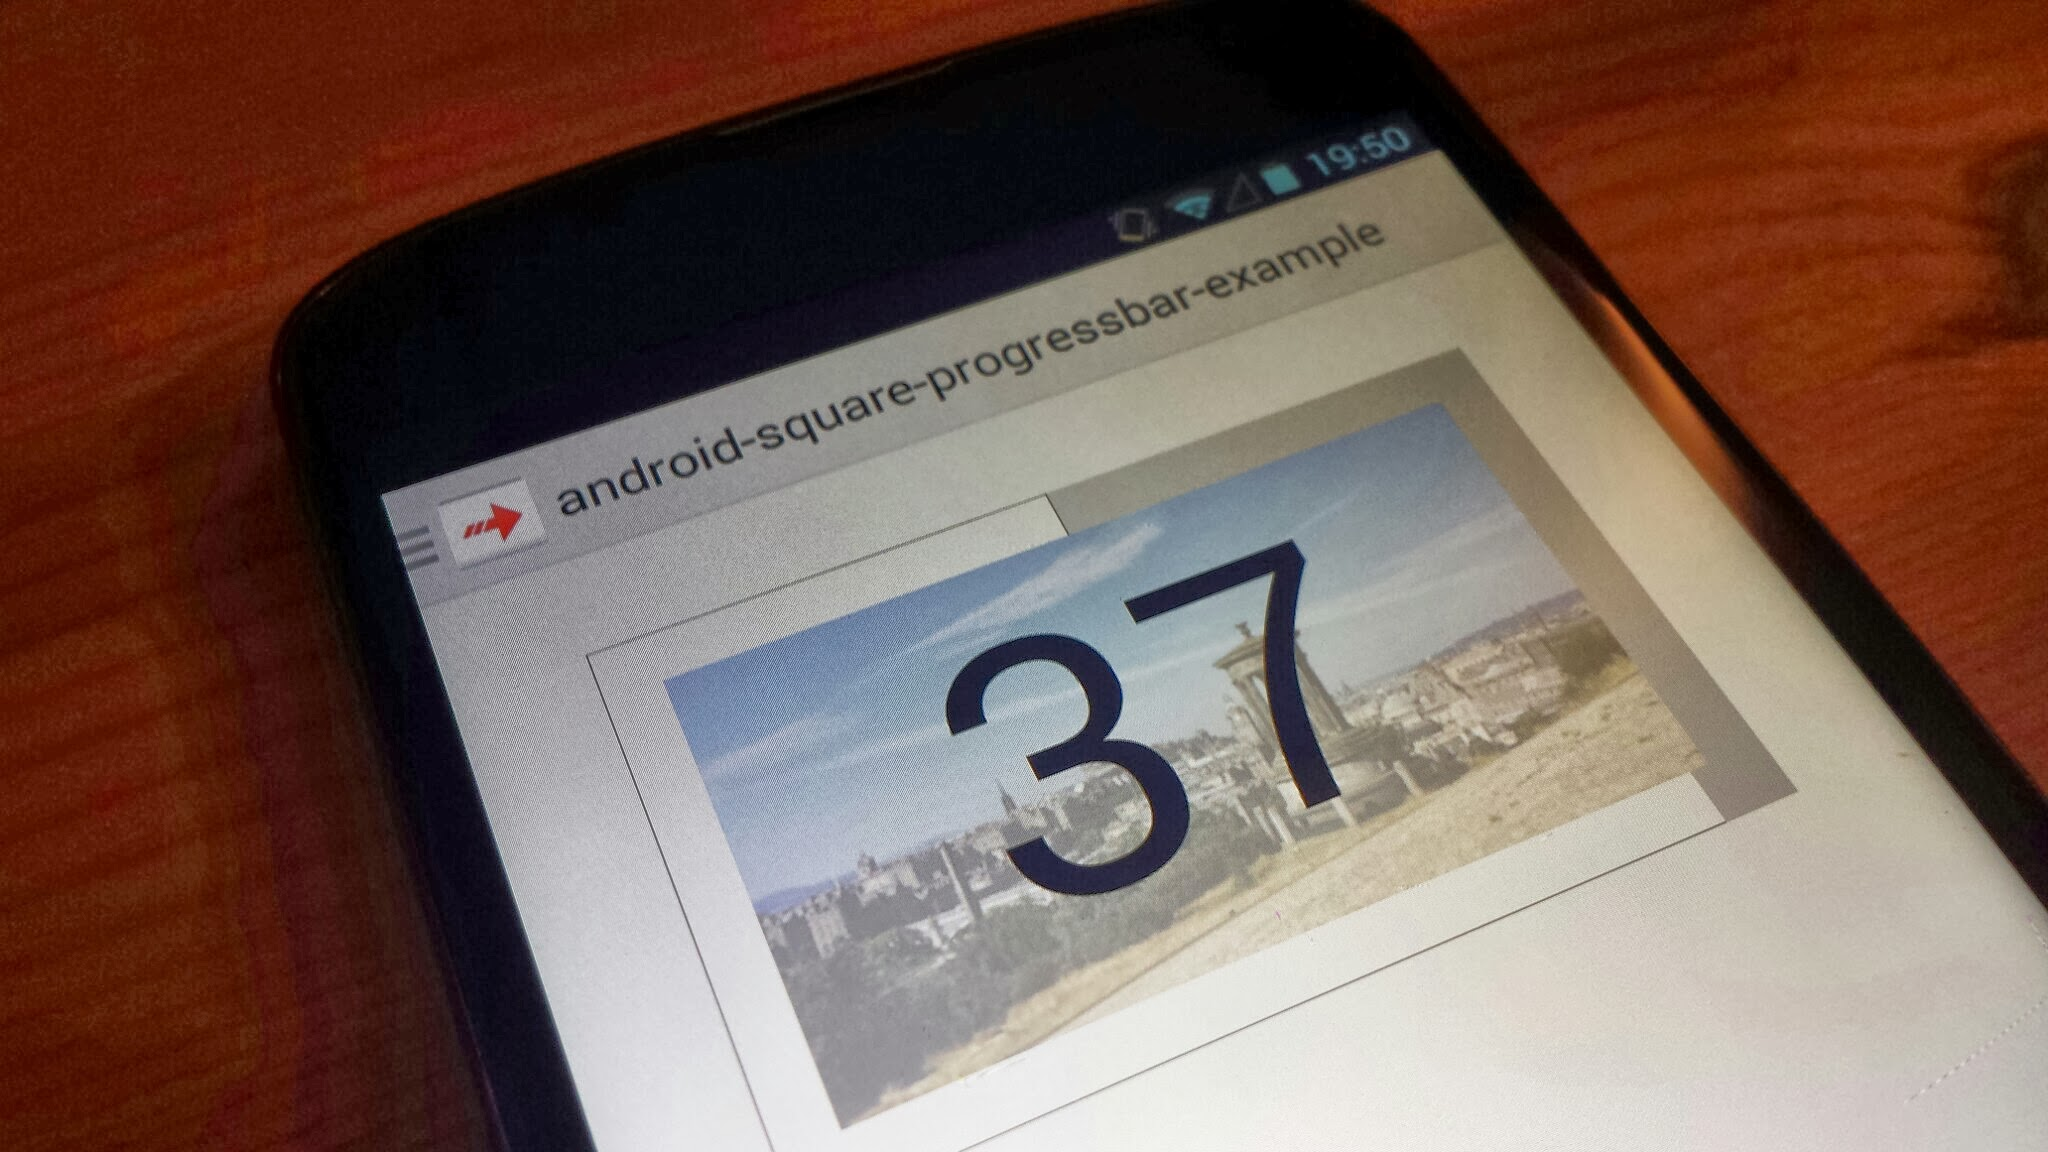 android-square-progressbar v.1.3.0